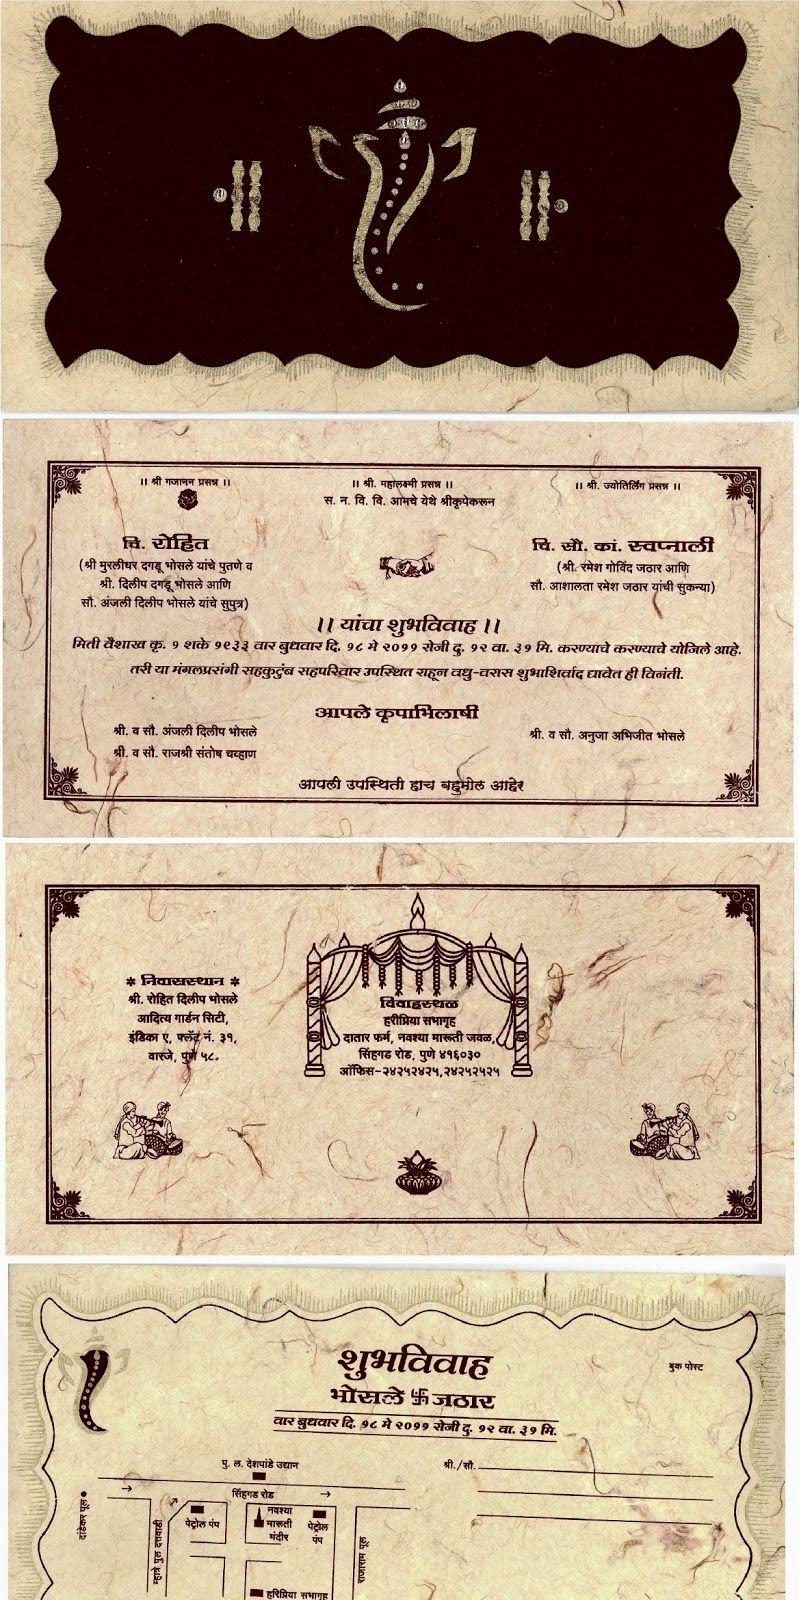 Art and Fashion: Marathi Lagna Patrika format and matter | Wedding  invitation message, Wedding reception invitation wording, Hindu wedding  invitation cards